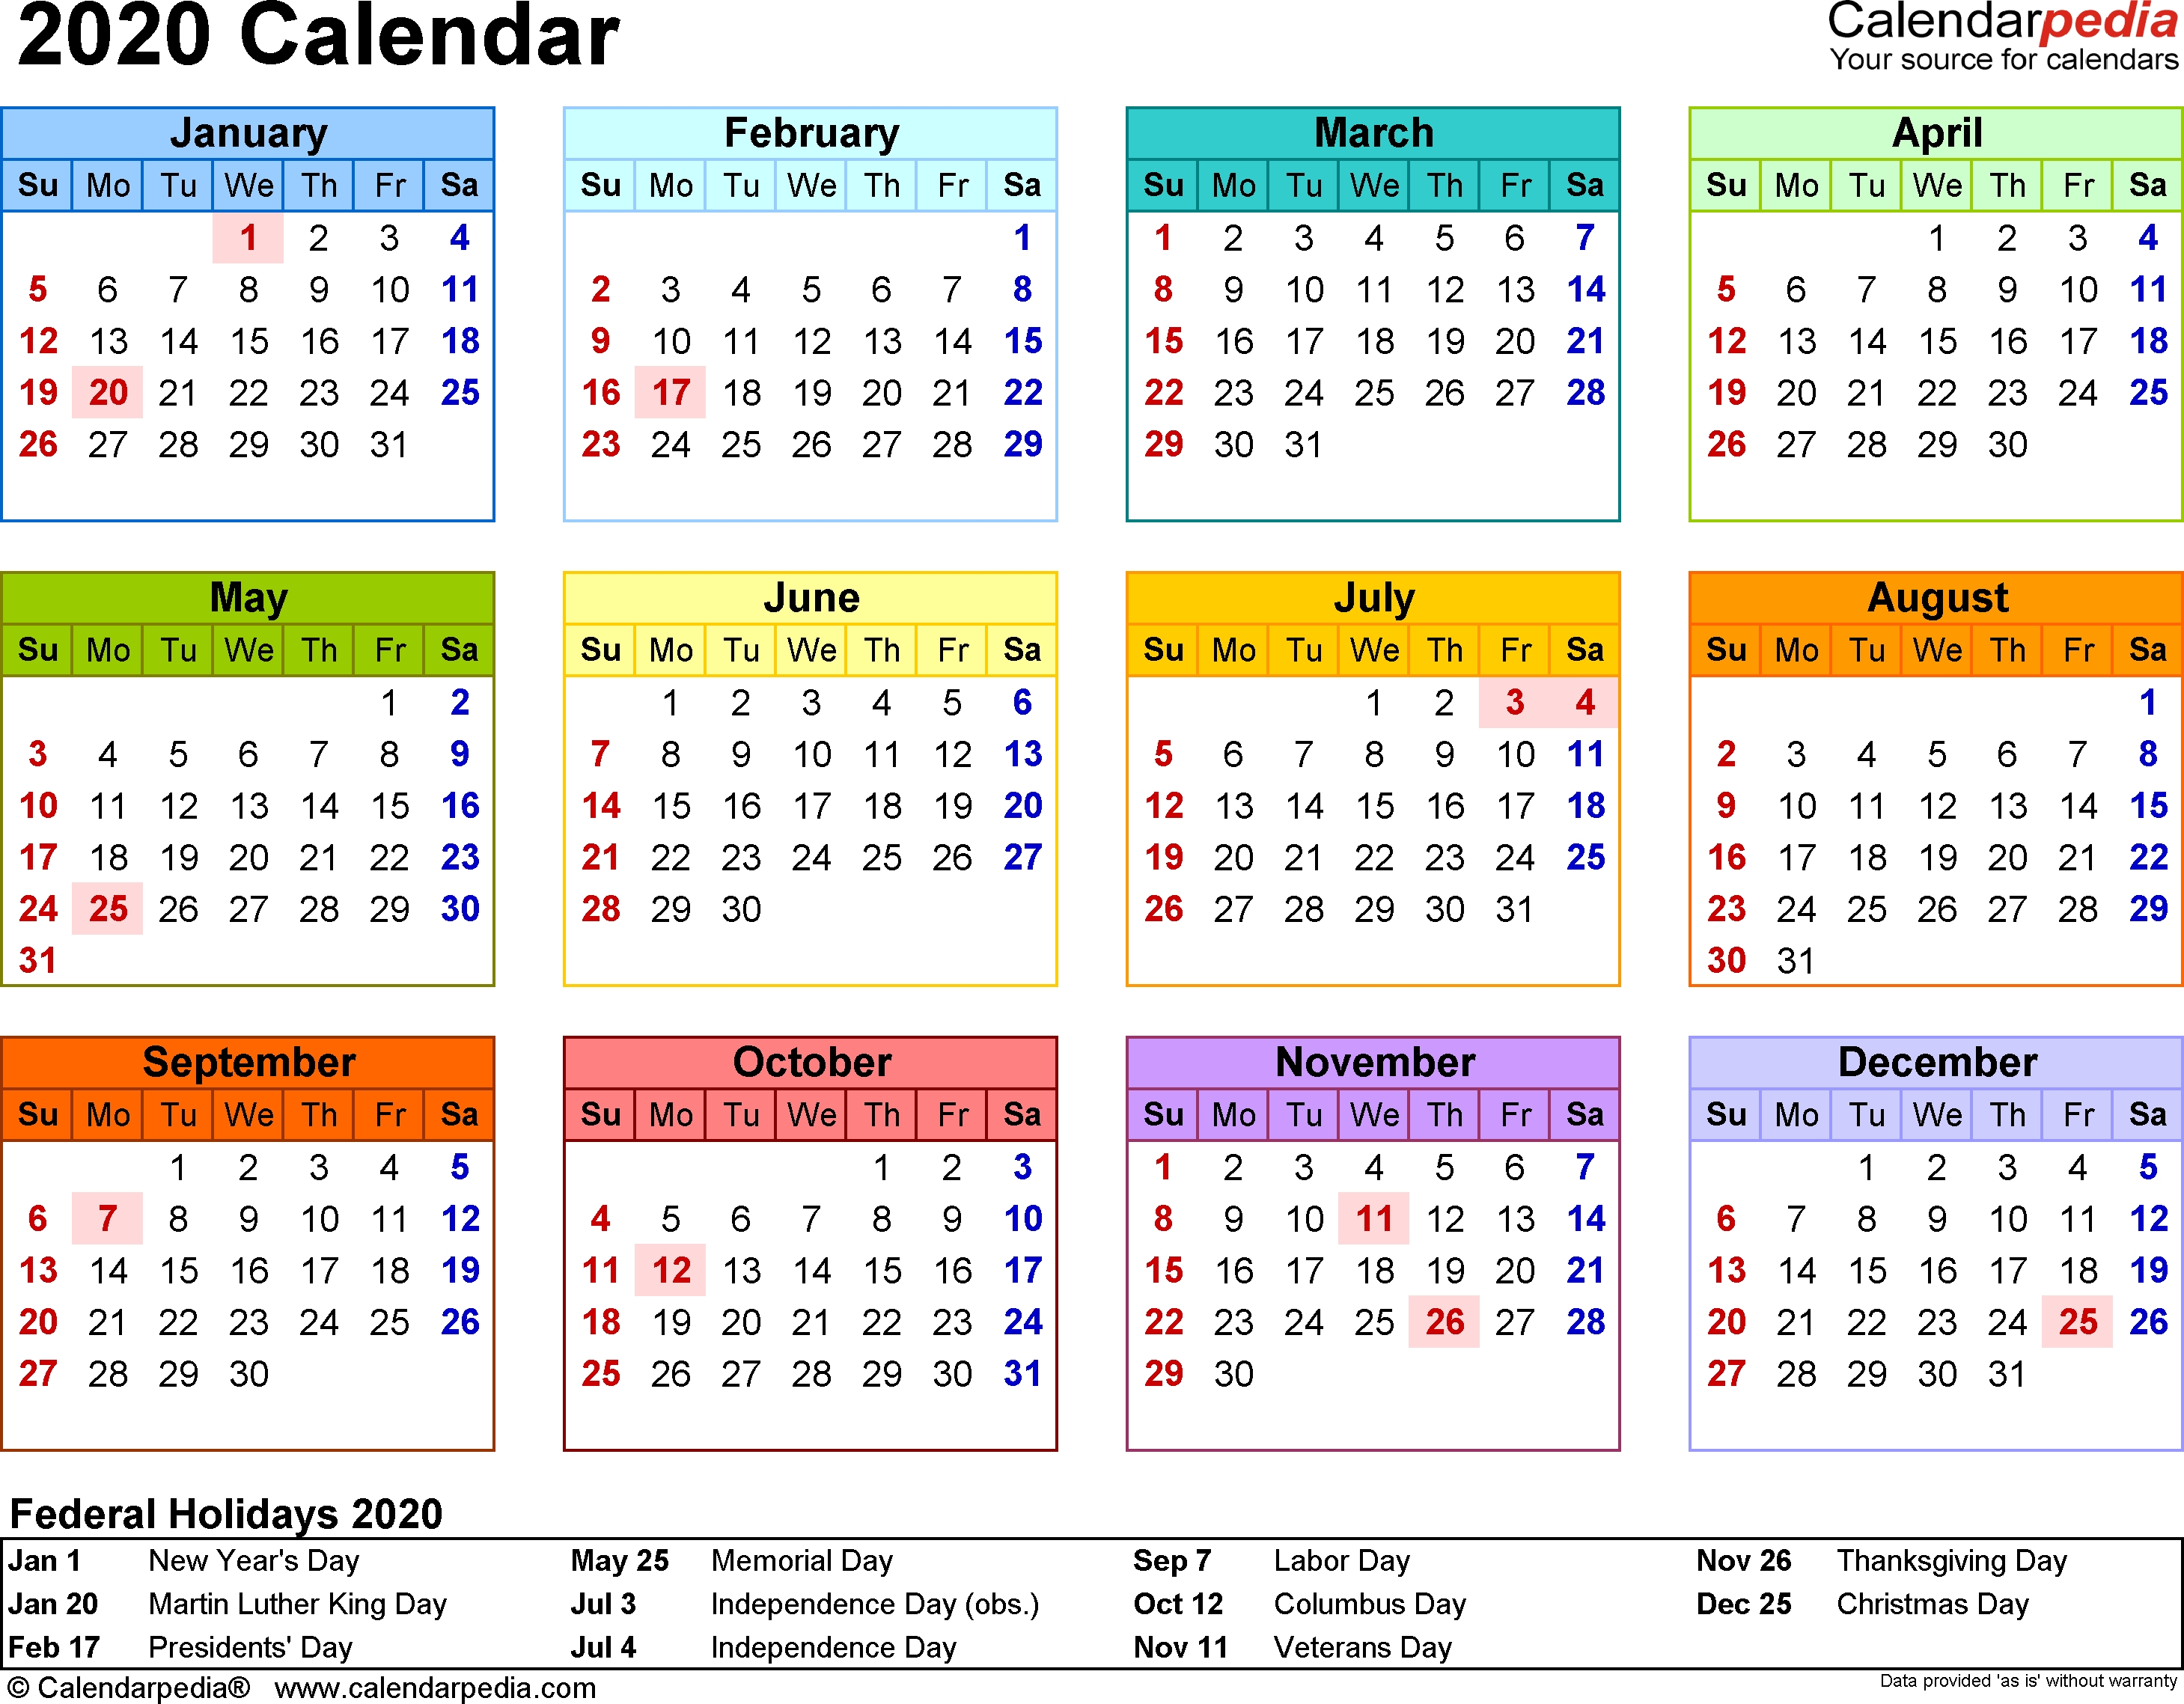 2020 Calendar - 18 Free Printable Word Calendar Templates-Calendar For 2020 Printable With Legal Holidays